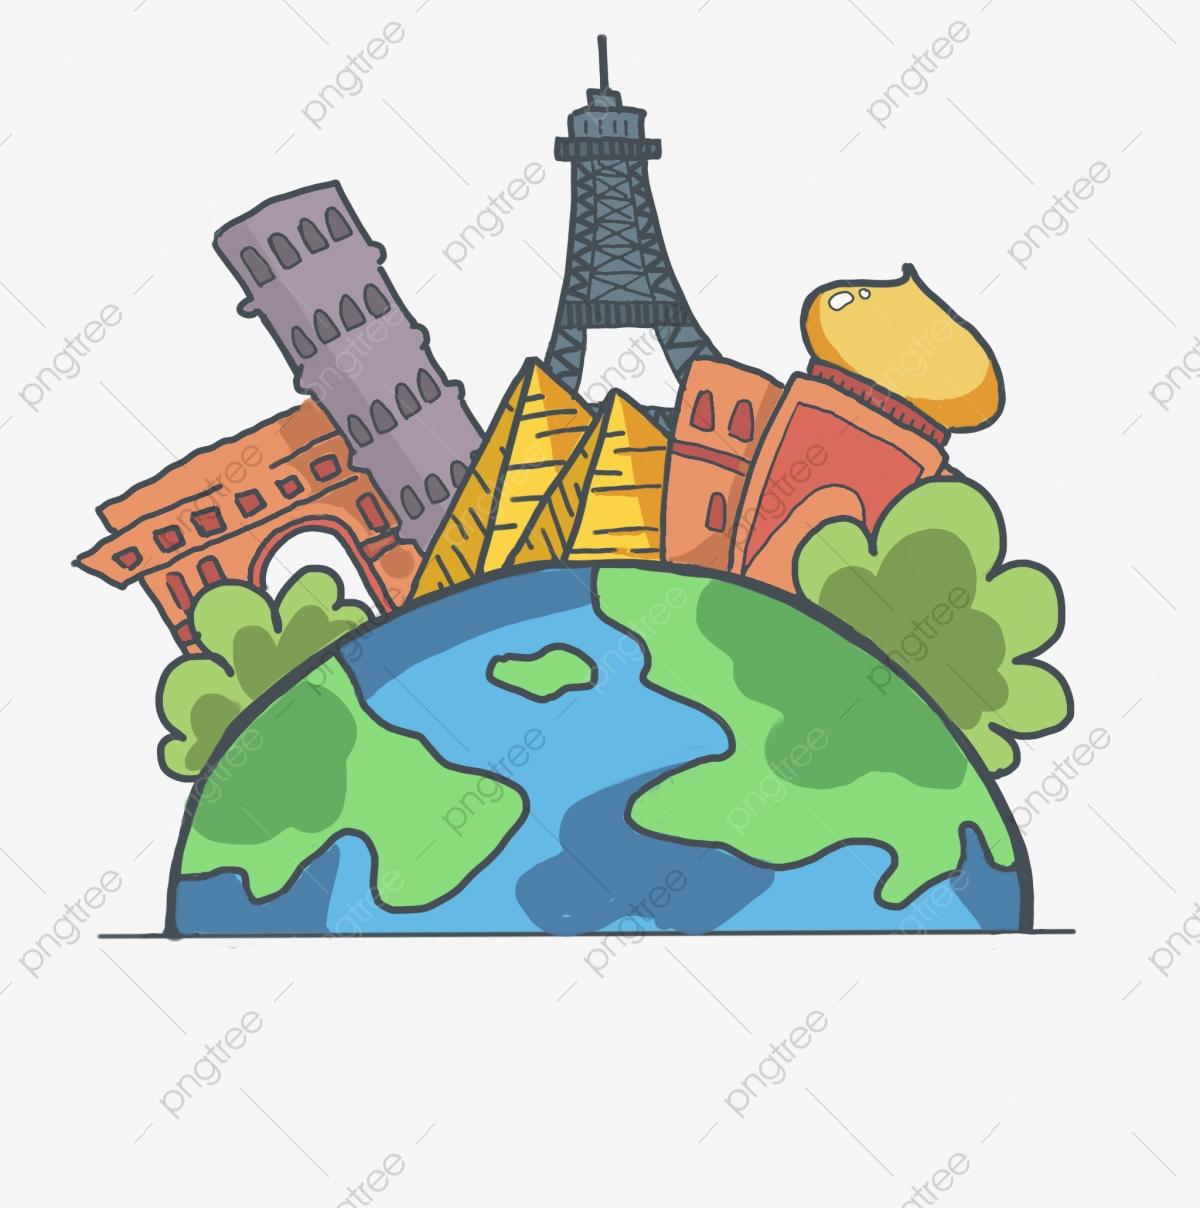 Travel Theme Travel Around The World Cartoon Illustration.